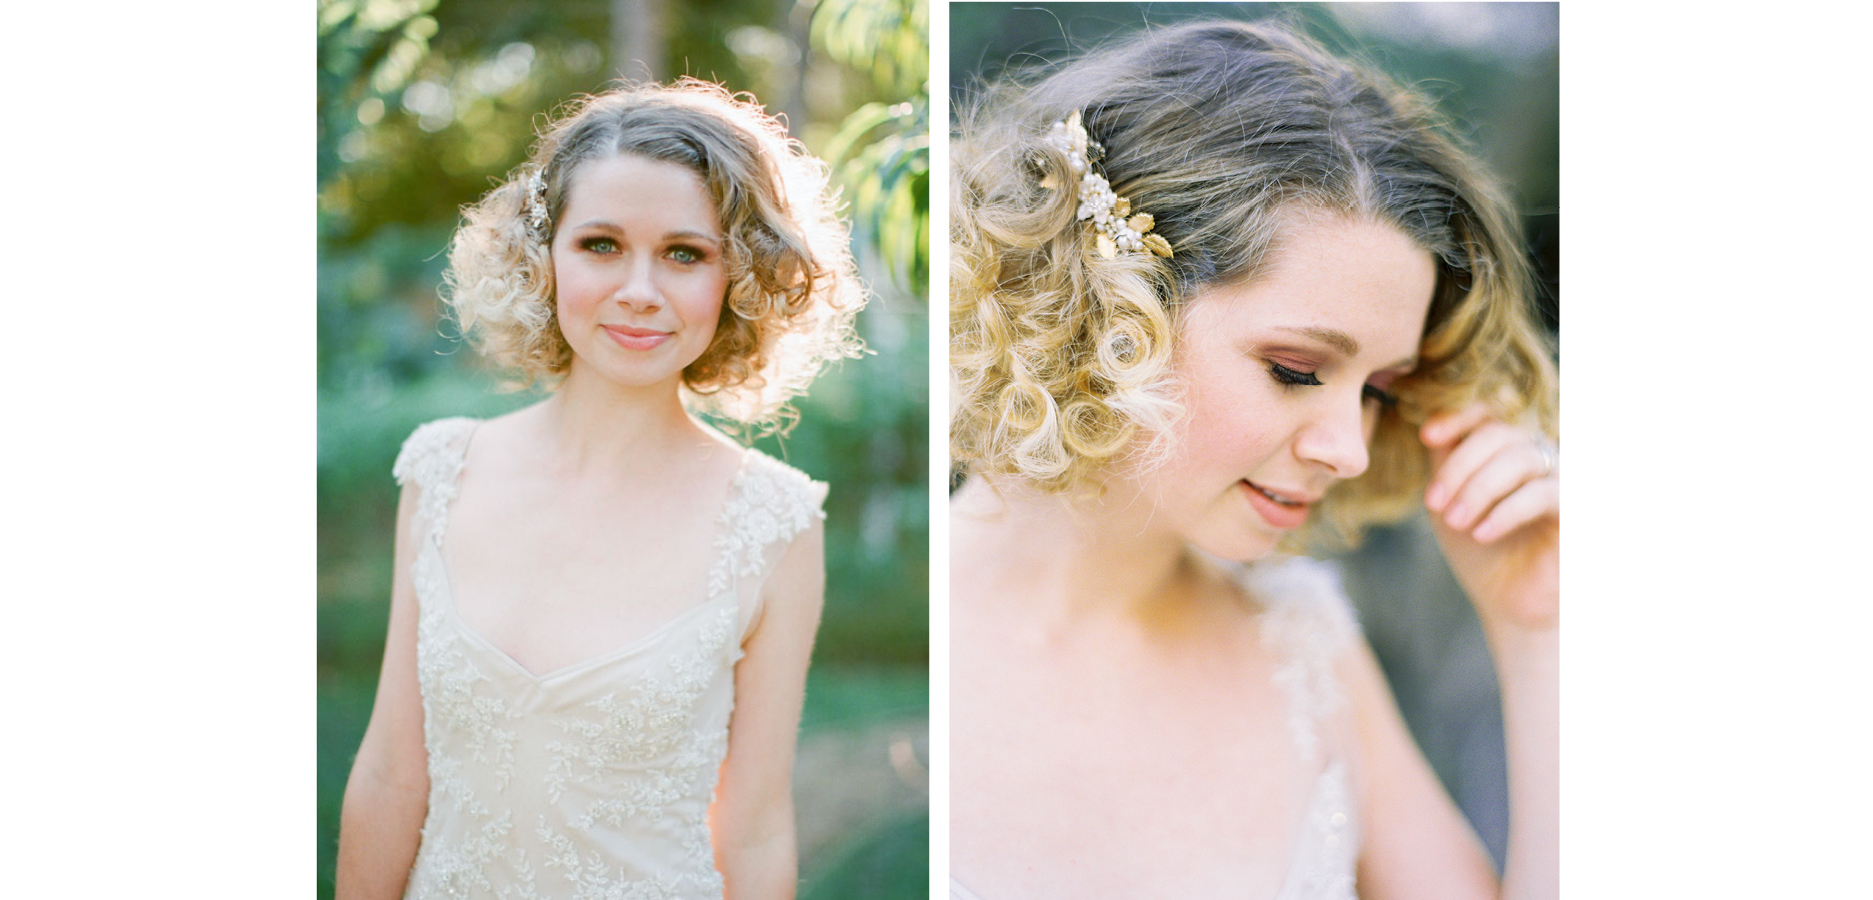 Jess-Wilcox-Hair-Makeup-Wedding_portfolio3.jpg